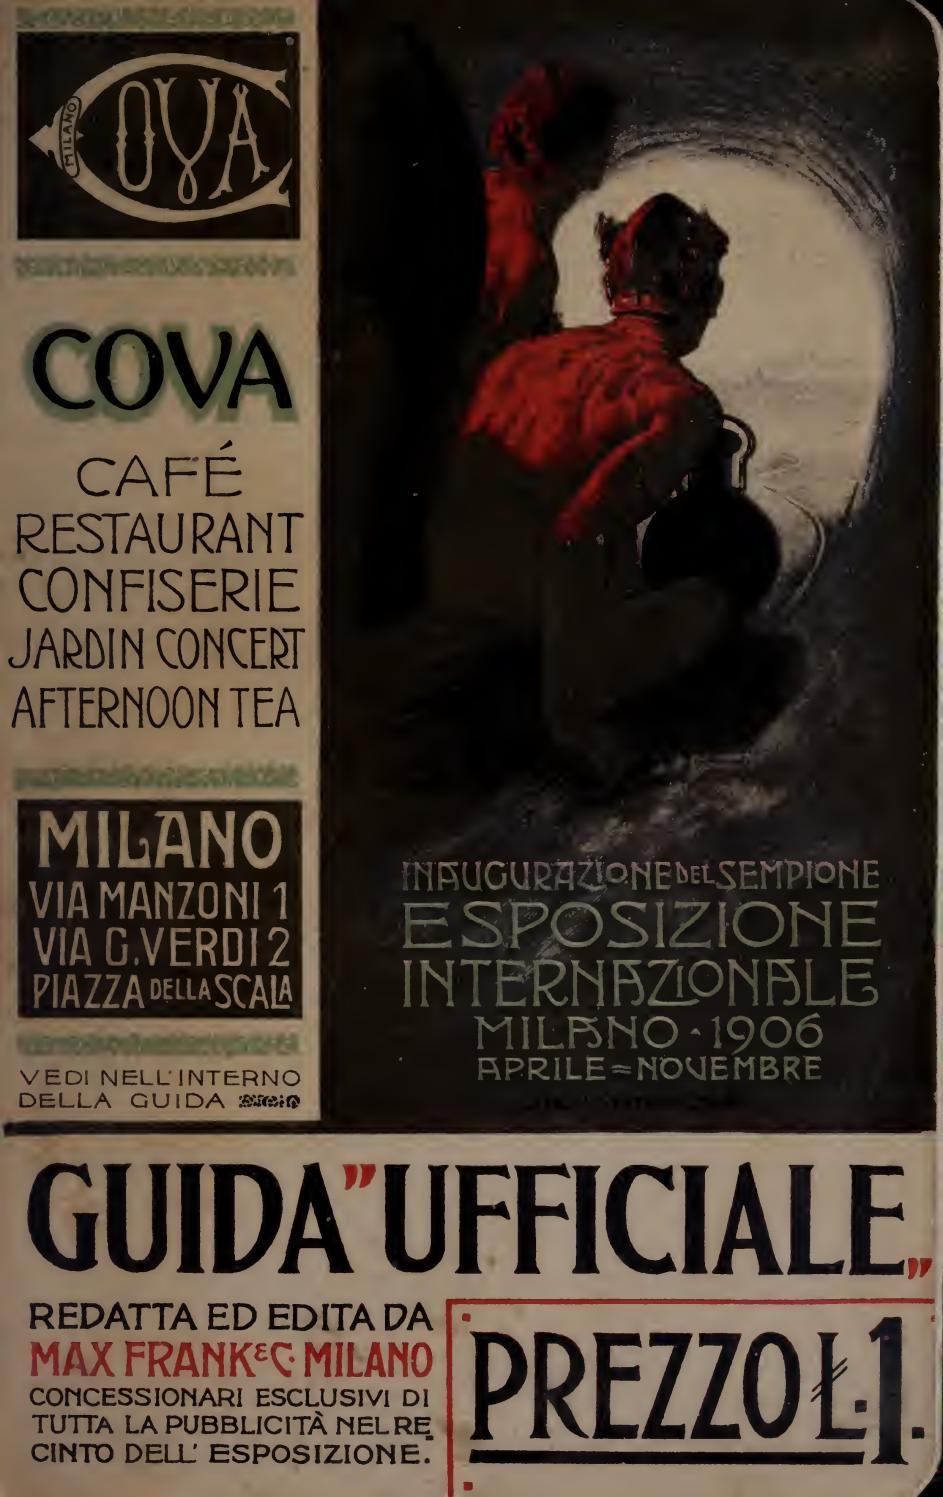 Guida ufficiale esposizione milano 1906 by Bruno Manuel dos Anjos Marques  Albano - issuu ea3812adcd5d